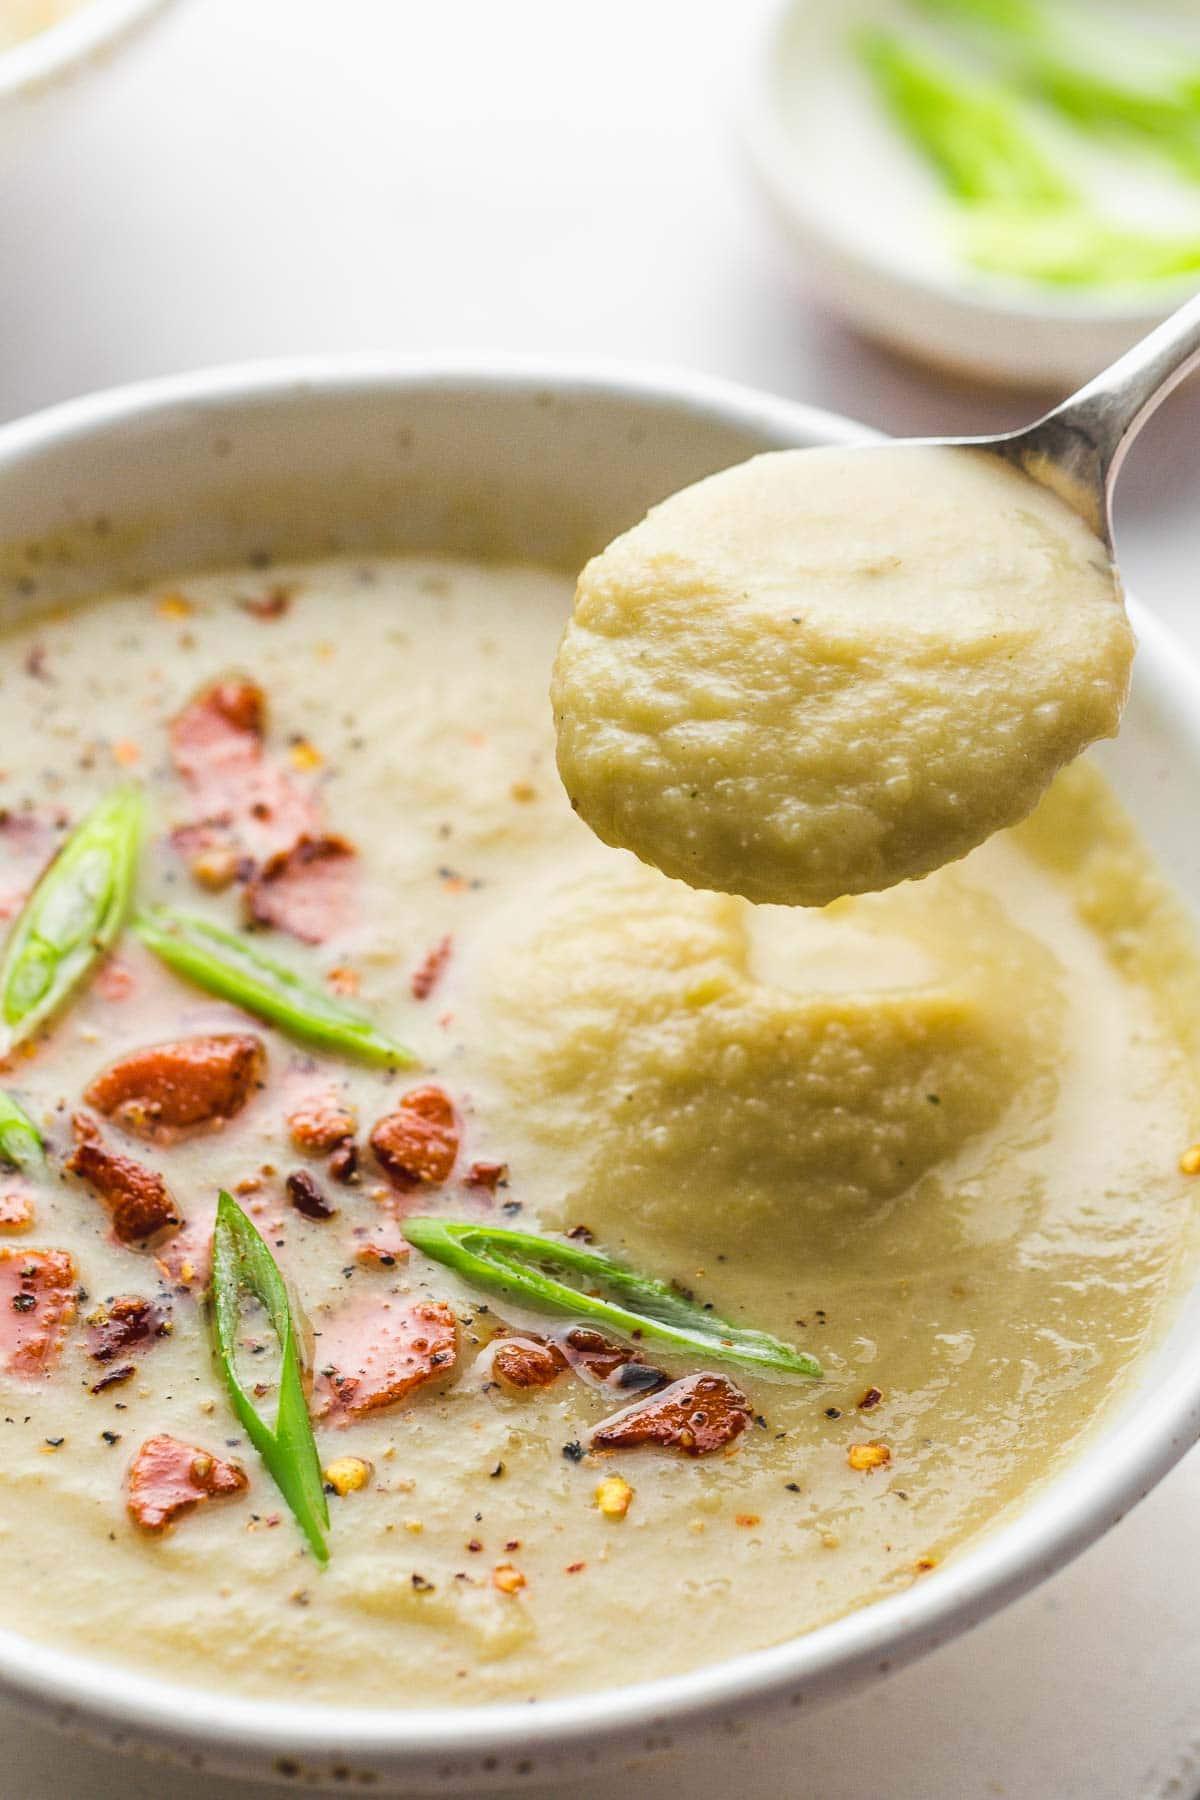 Close up of a spoonful of cauliflower leek soup